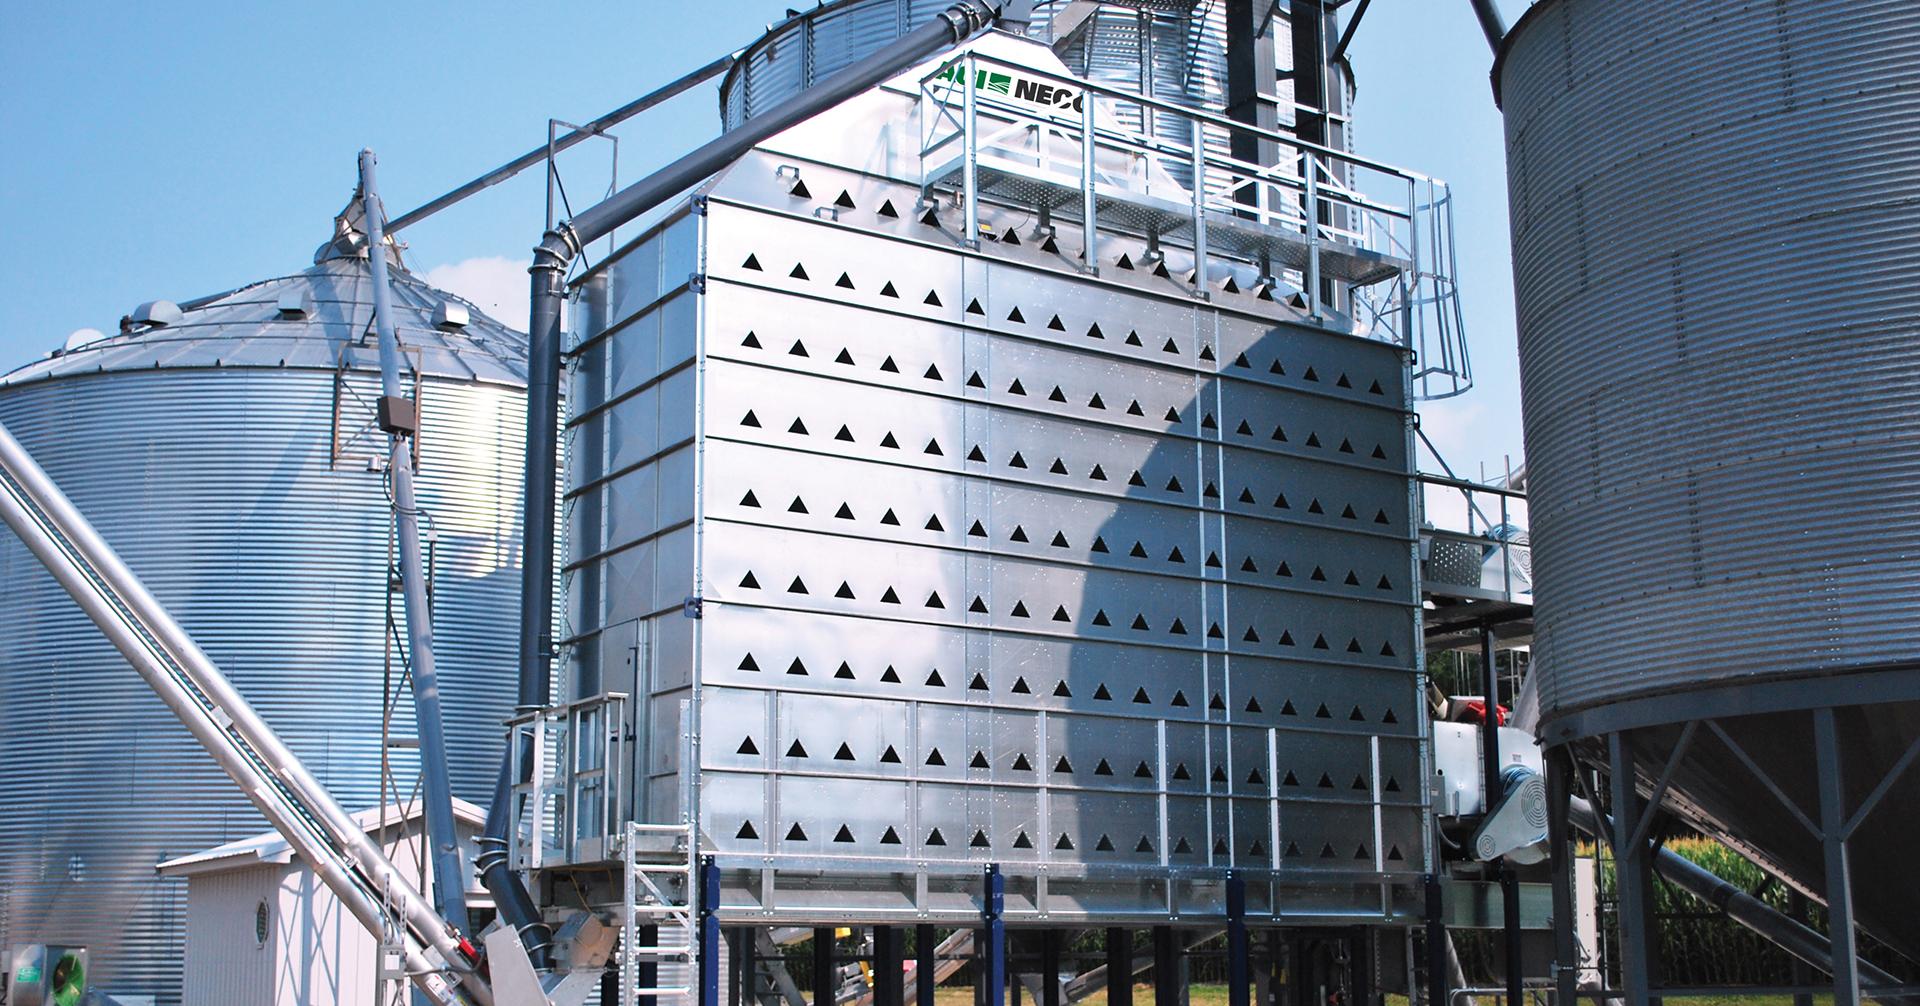 Neco Grain Dryer Installation